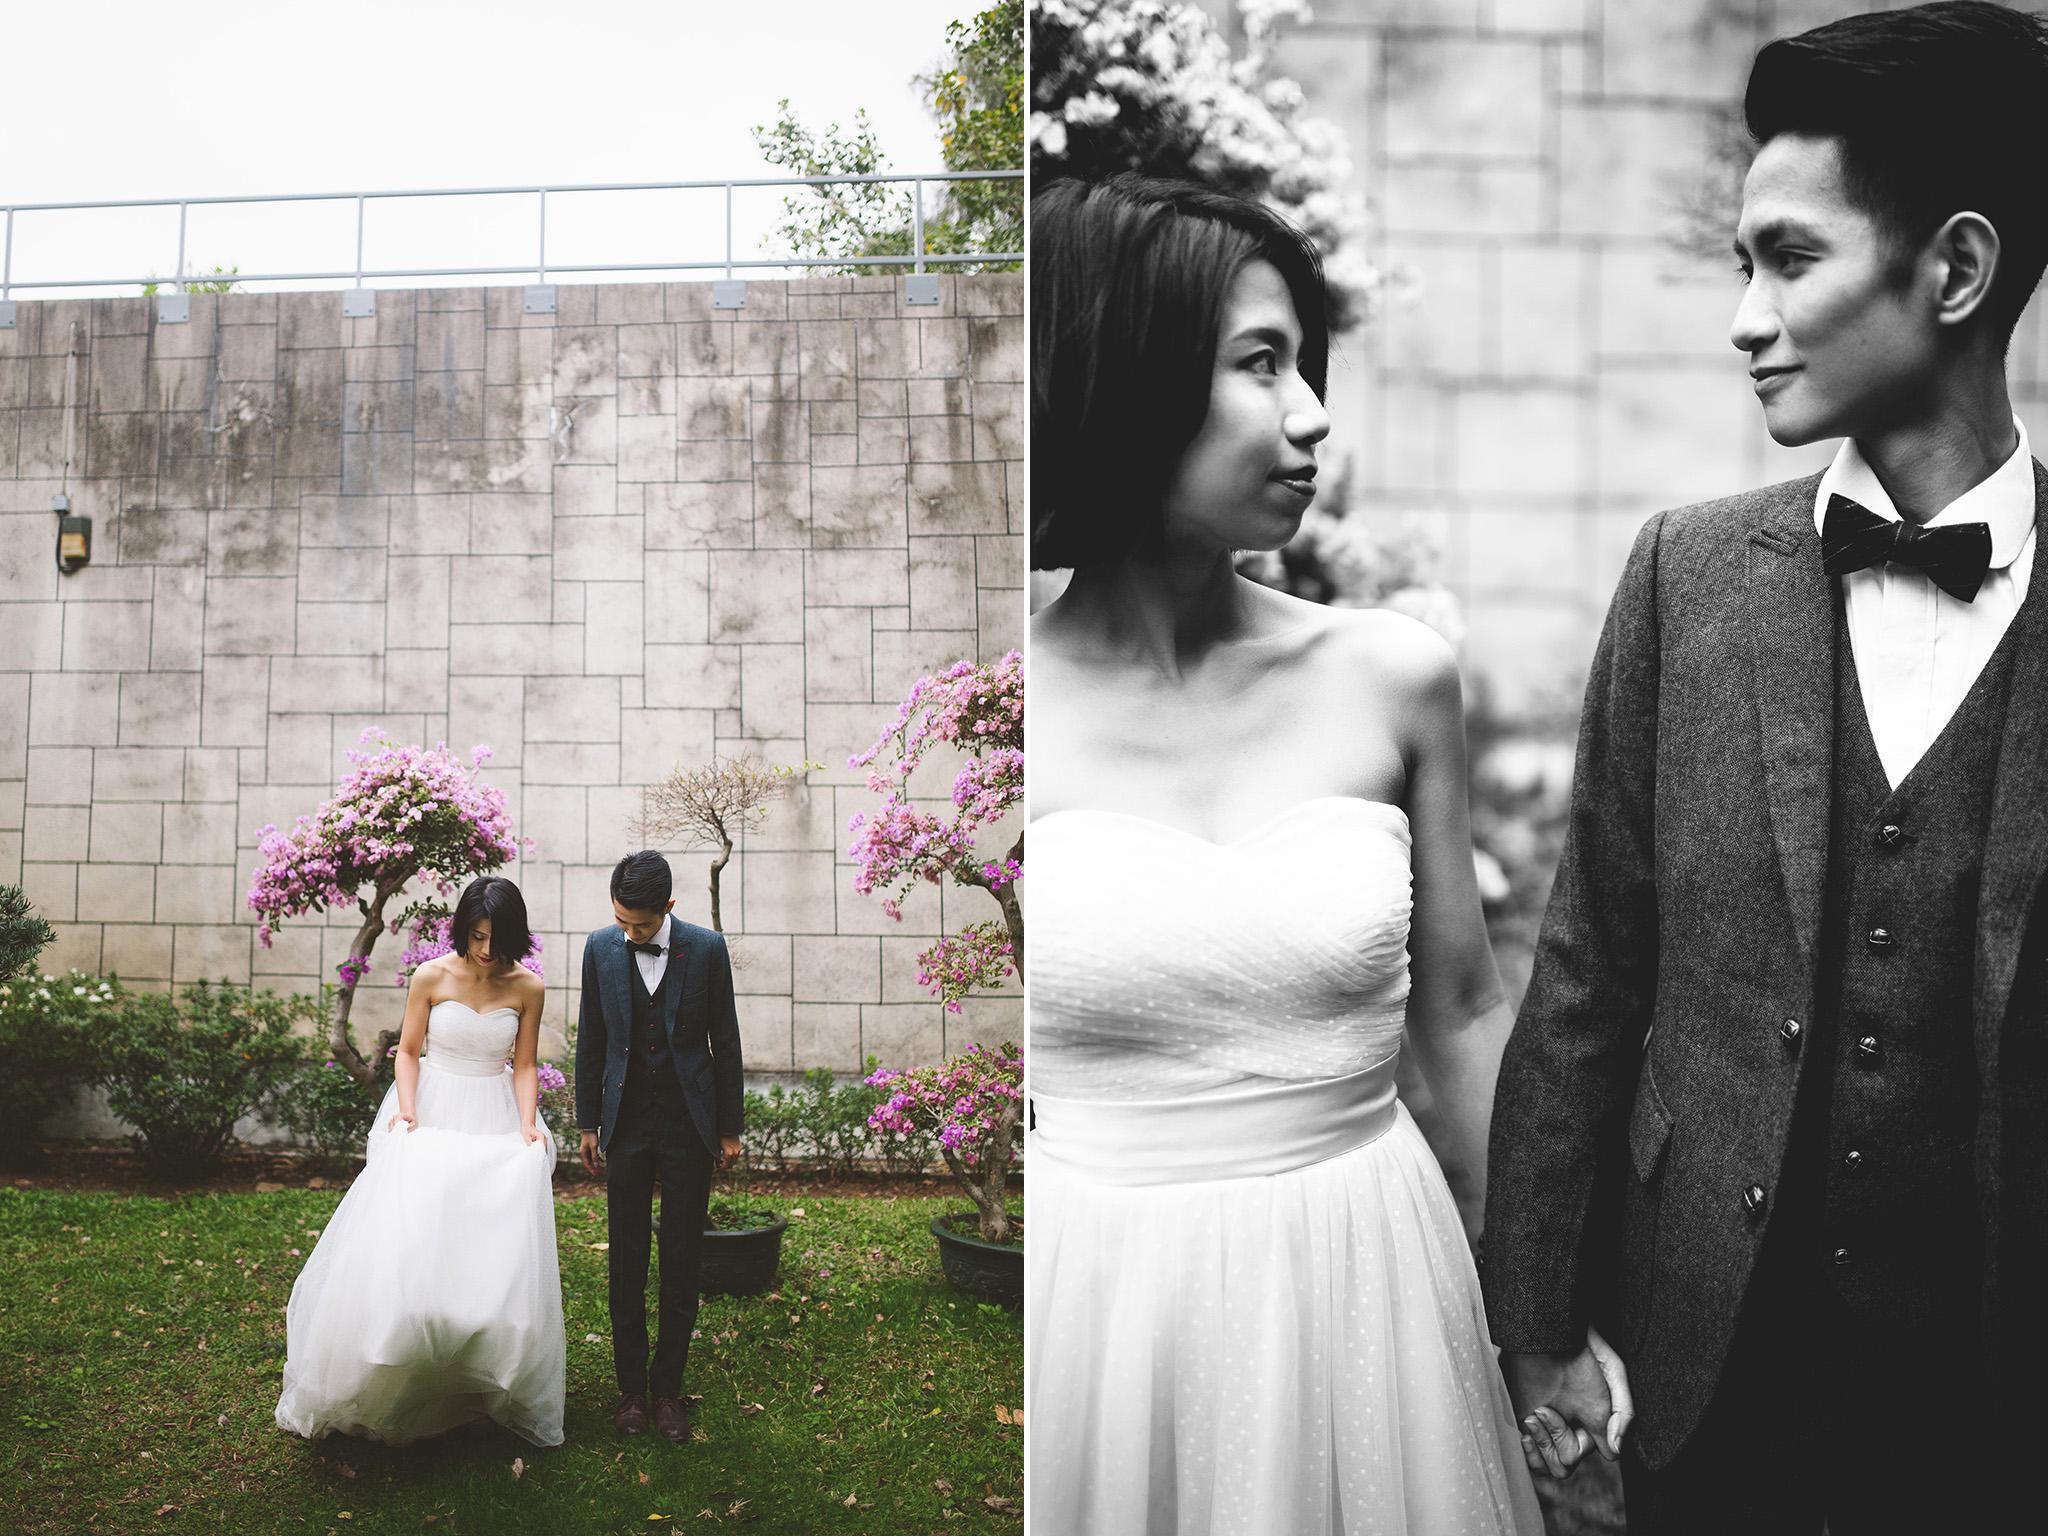 Hong Kong Wedding Pictures